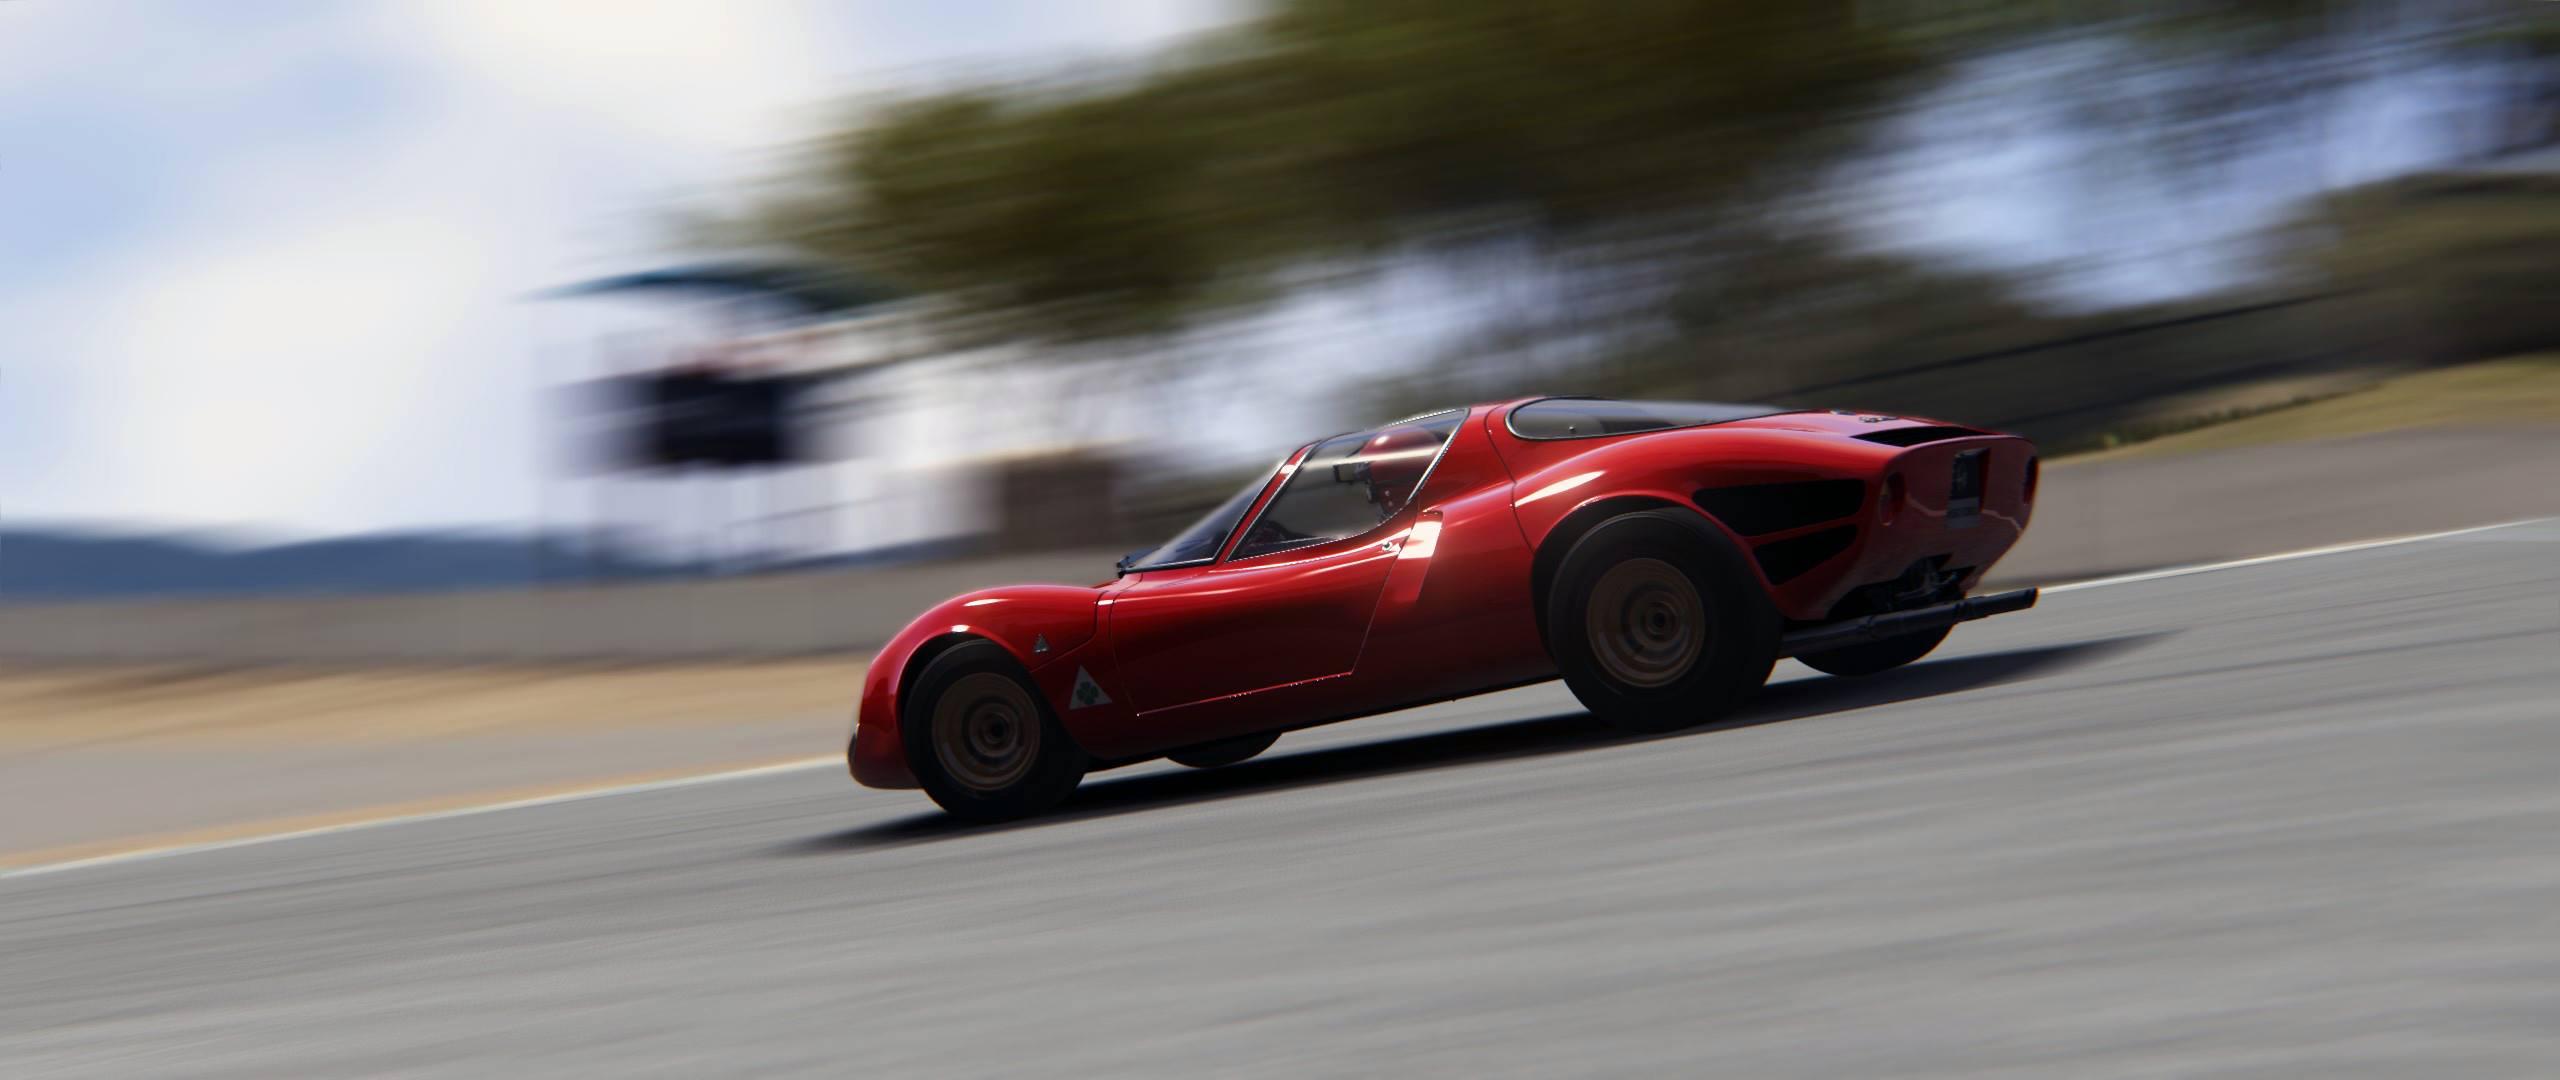 Assetto Corsa Bonus Pack 3 DLC Preview Alfa 33.jpg